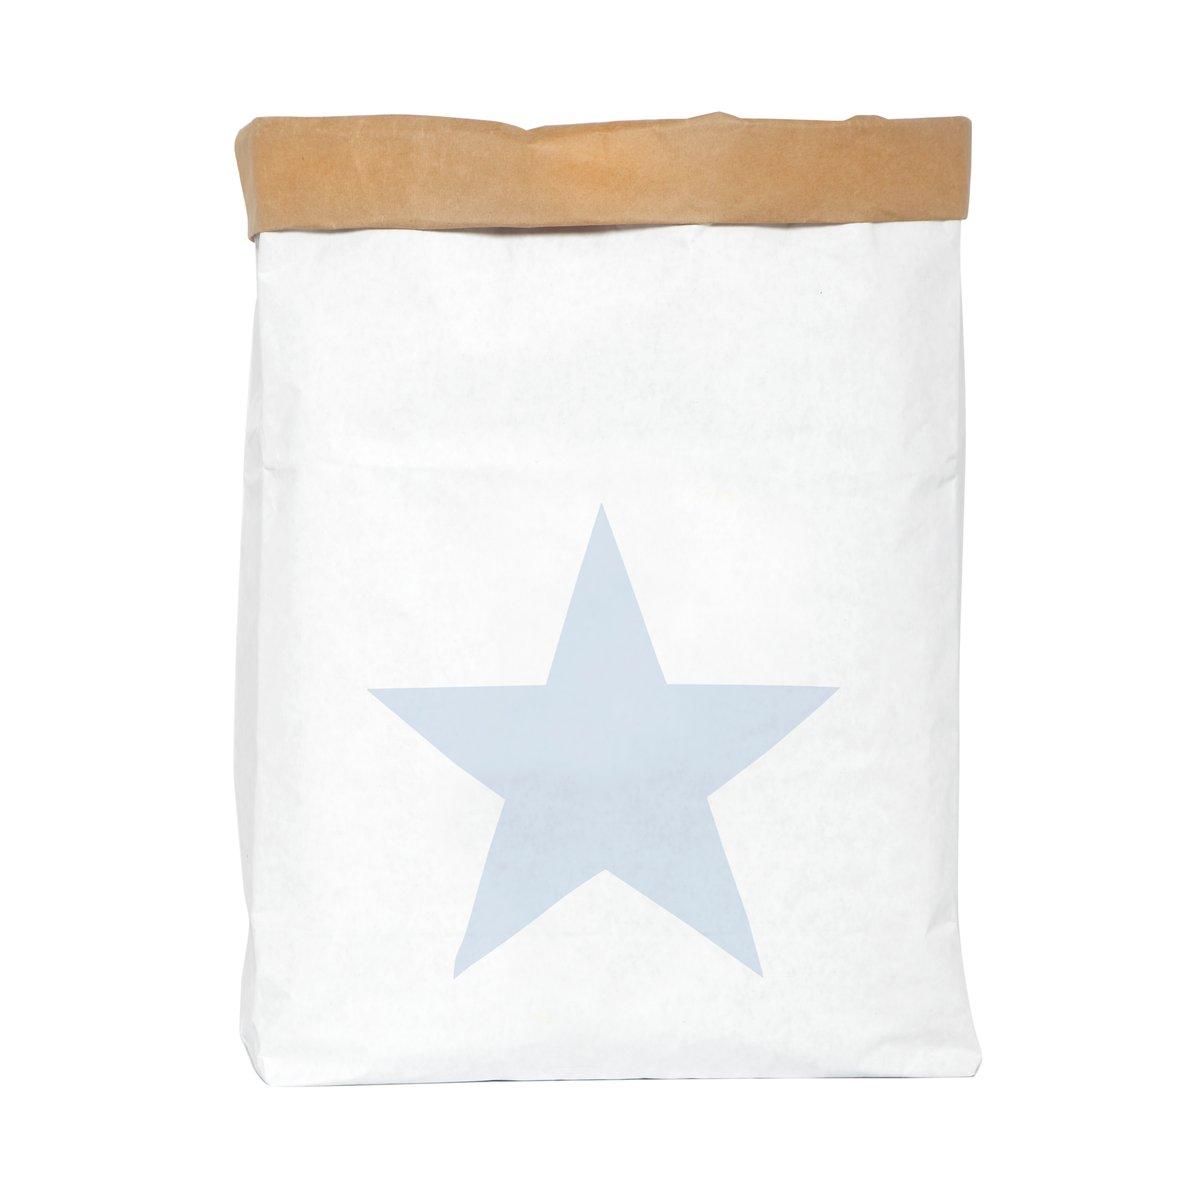 Image of Be - Nized Estrella Azul Mini